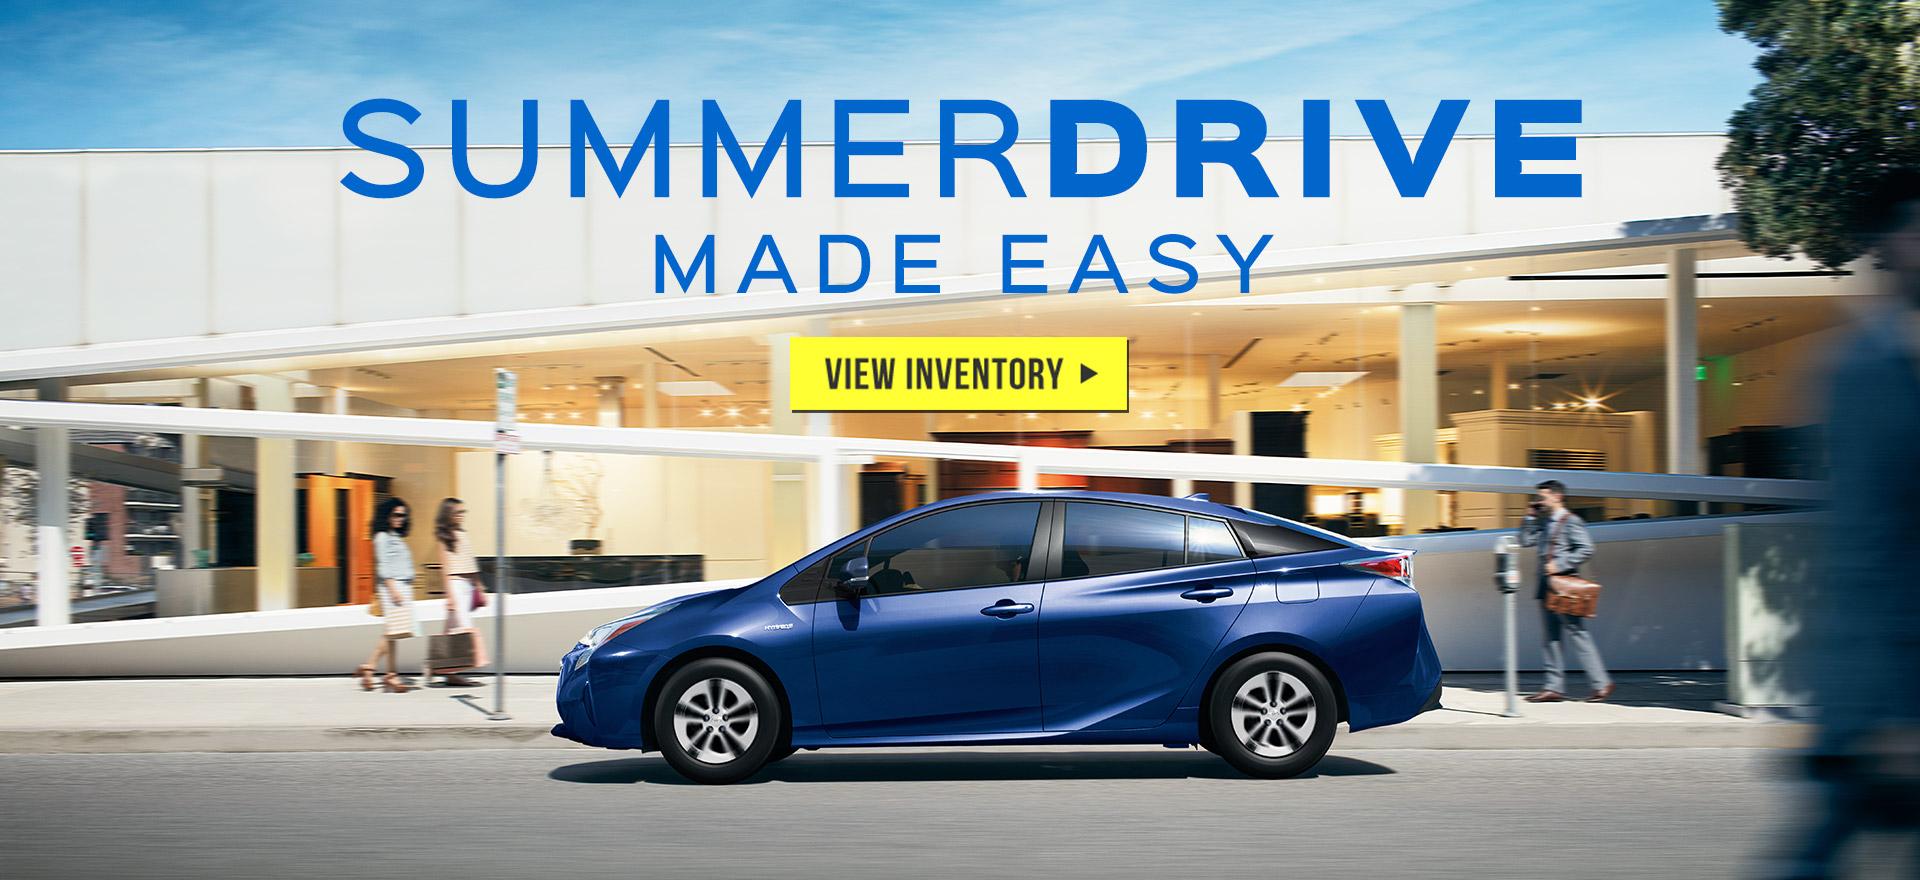 Toyota Carlsbad Service >> Toyota Escondido serving San Diego, Carlsbad | Toyota ...